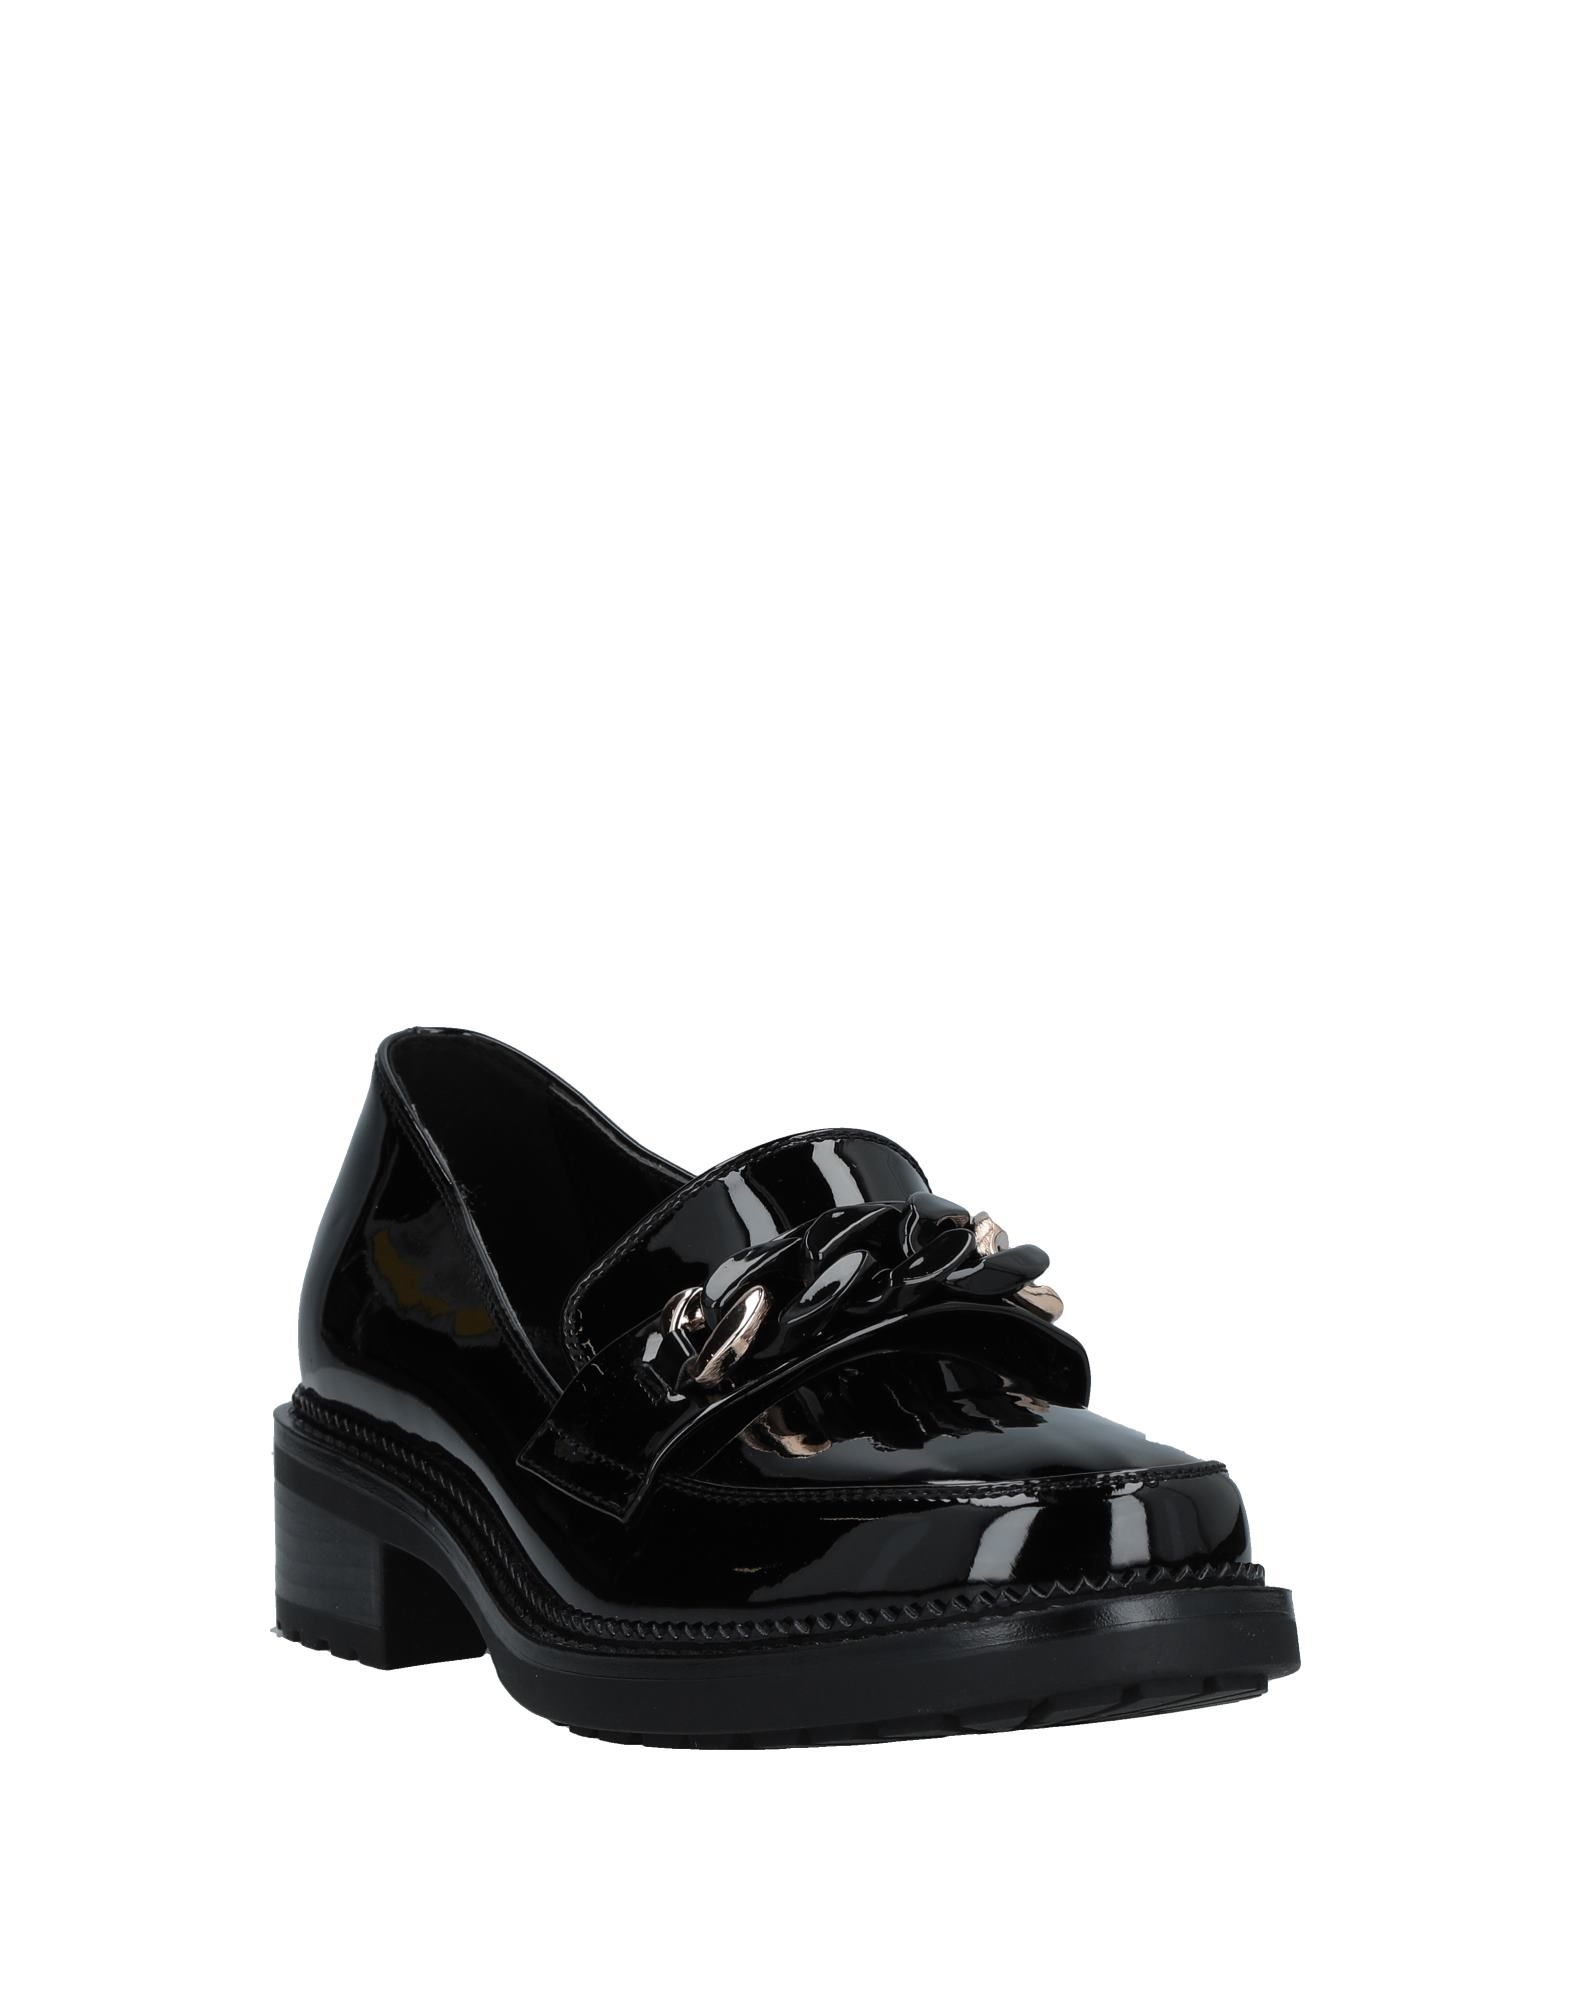 Vivien 11497913WG Lee Mokassins Damen  11497913WG Vivien Gute Qualität beliebte Schuhe c1eeef